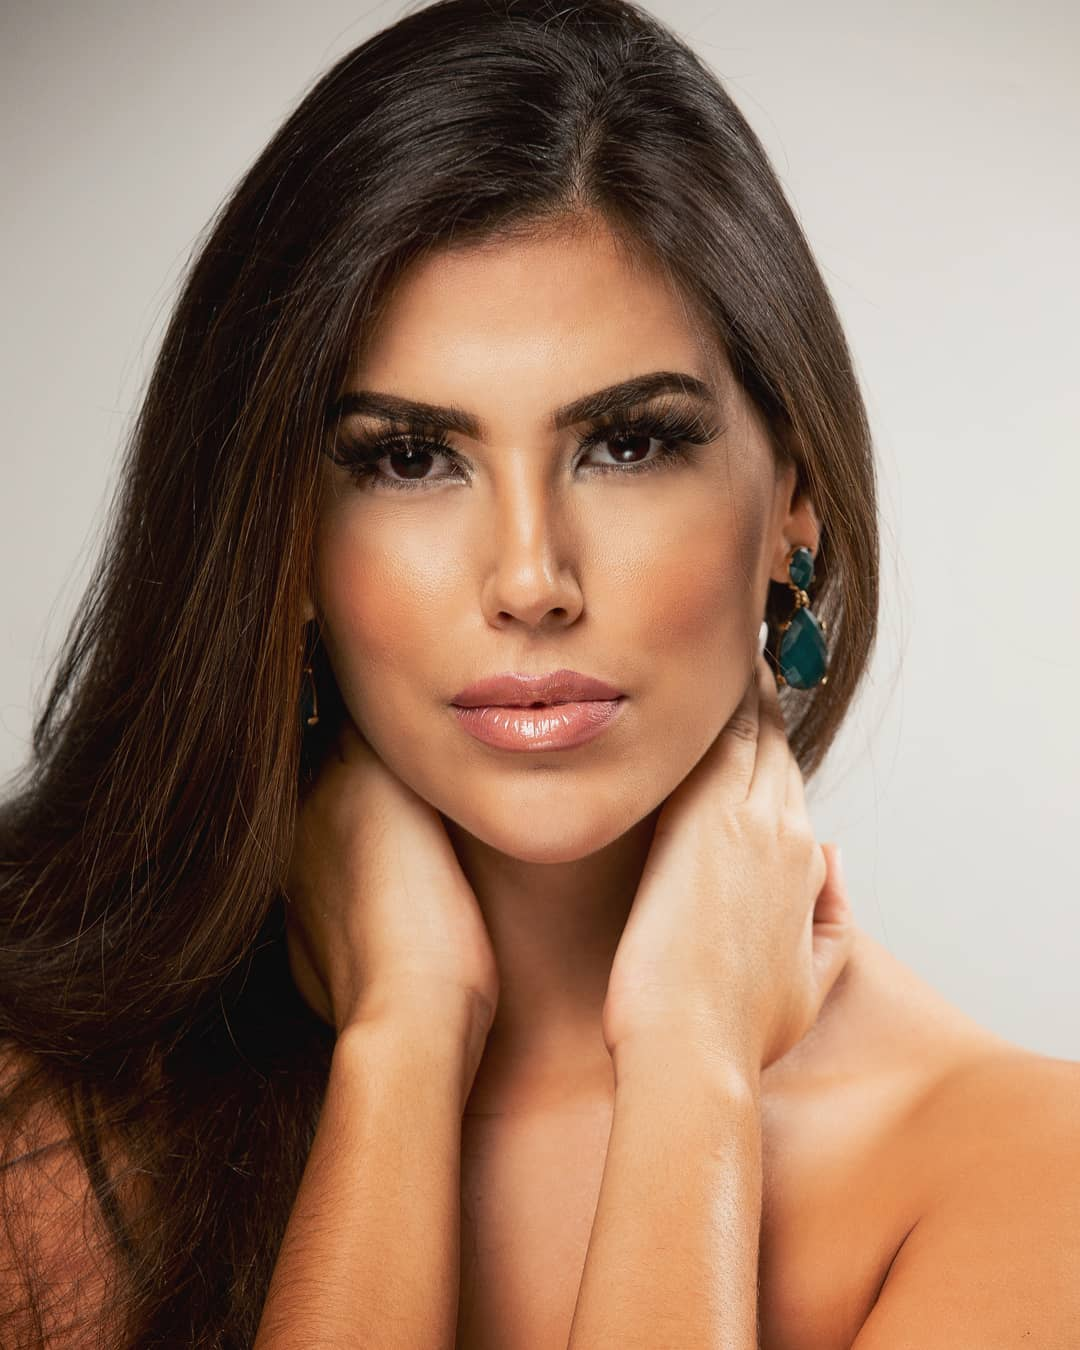 sofia del prado, top 10 de miss universe 2017/reyna hispanoamericana 2015/miss charm spain 2021. - Página 14 Sofiad19